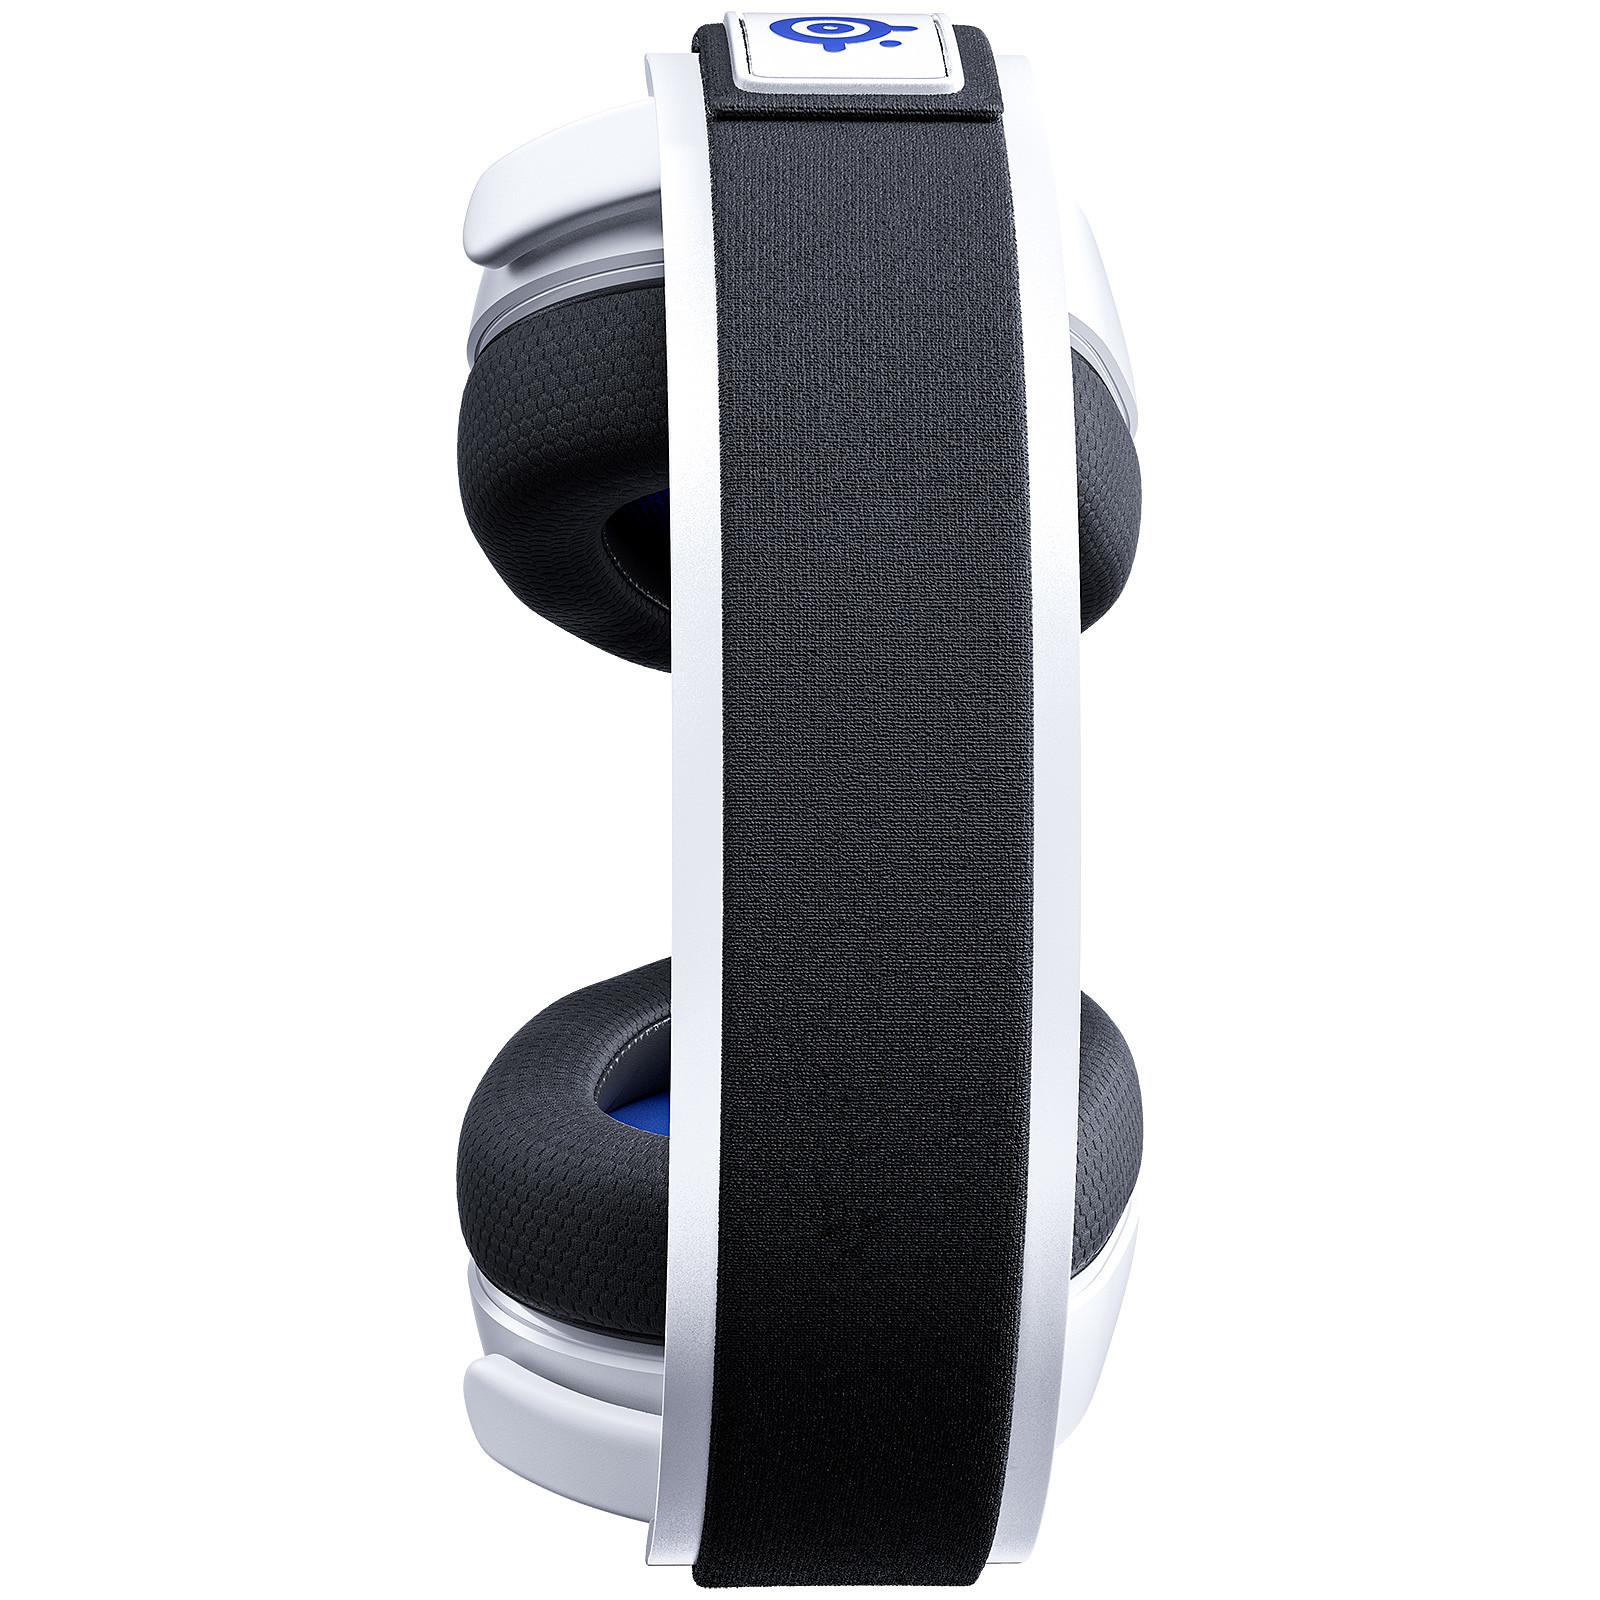 SteelSeries Arctis 7P (blanco) - Auriculares microfono SteelSeries